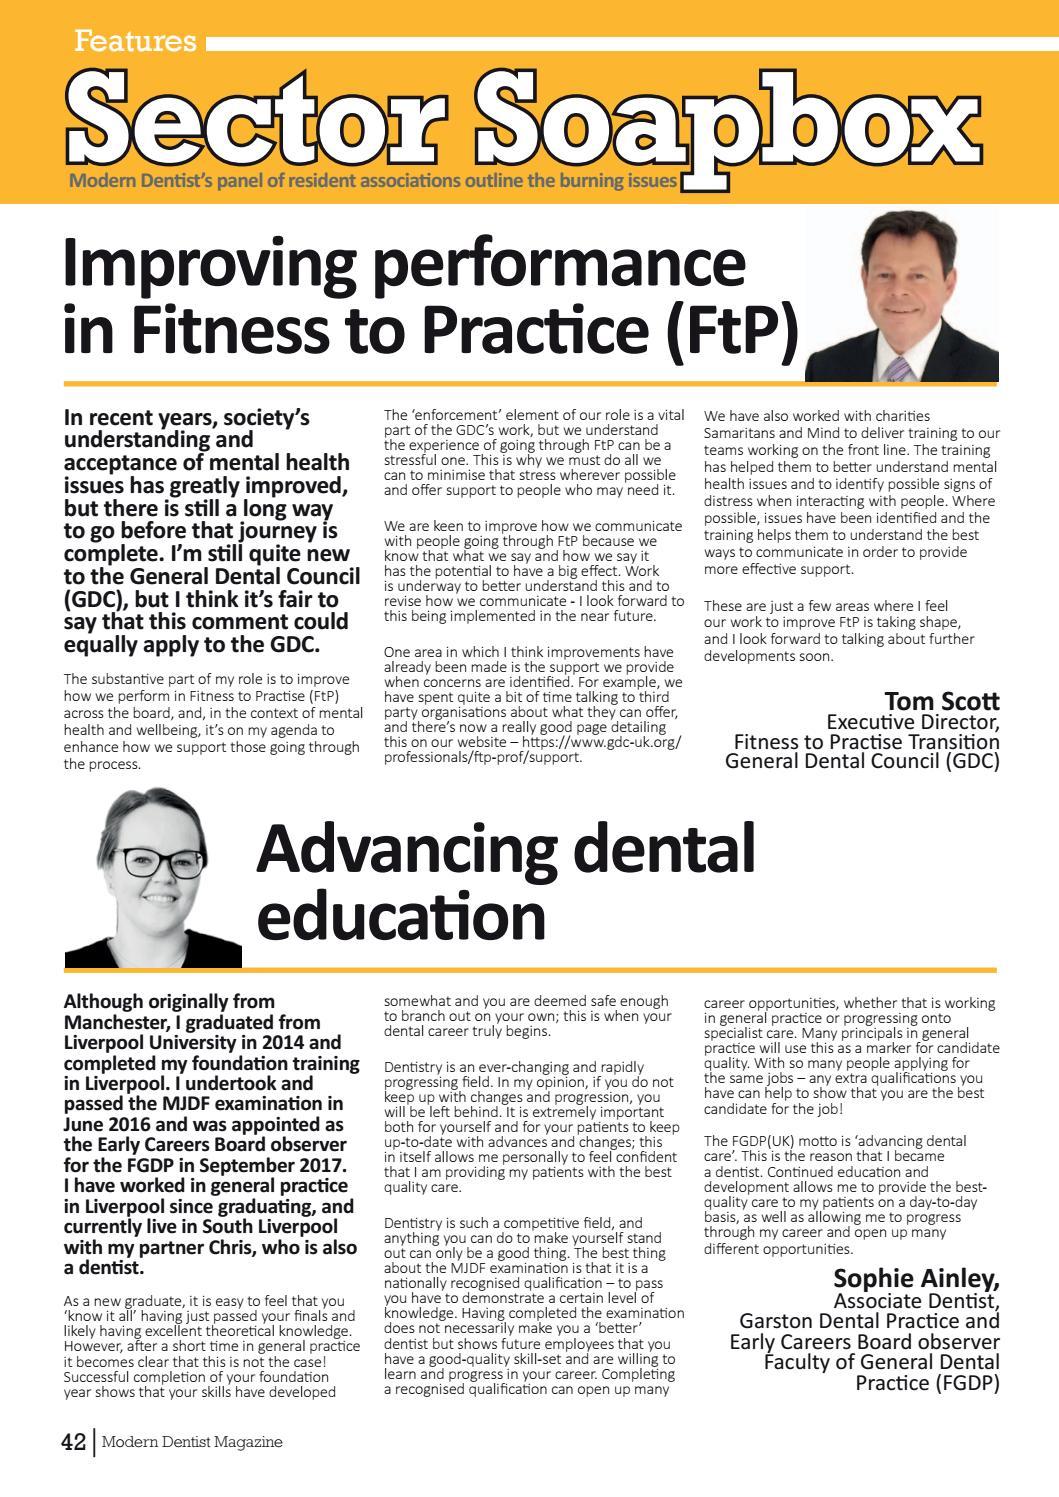 Modern Dentist Magazine Issue 2 by Charlton Grant - issuu